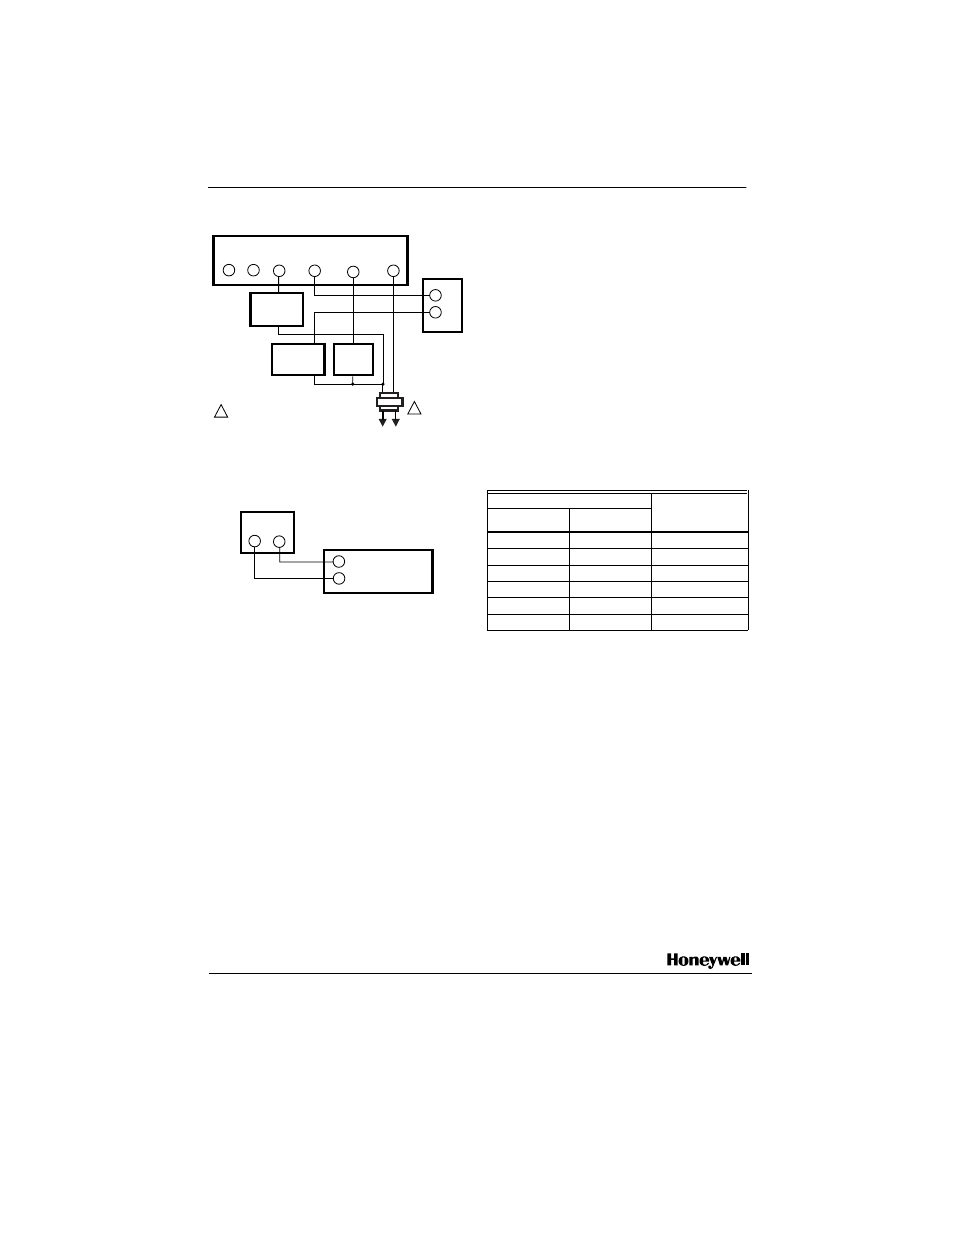 Humidistat Control Wiring Diagram